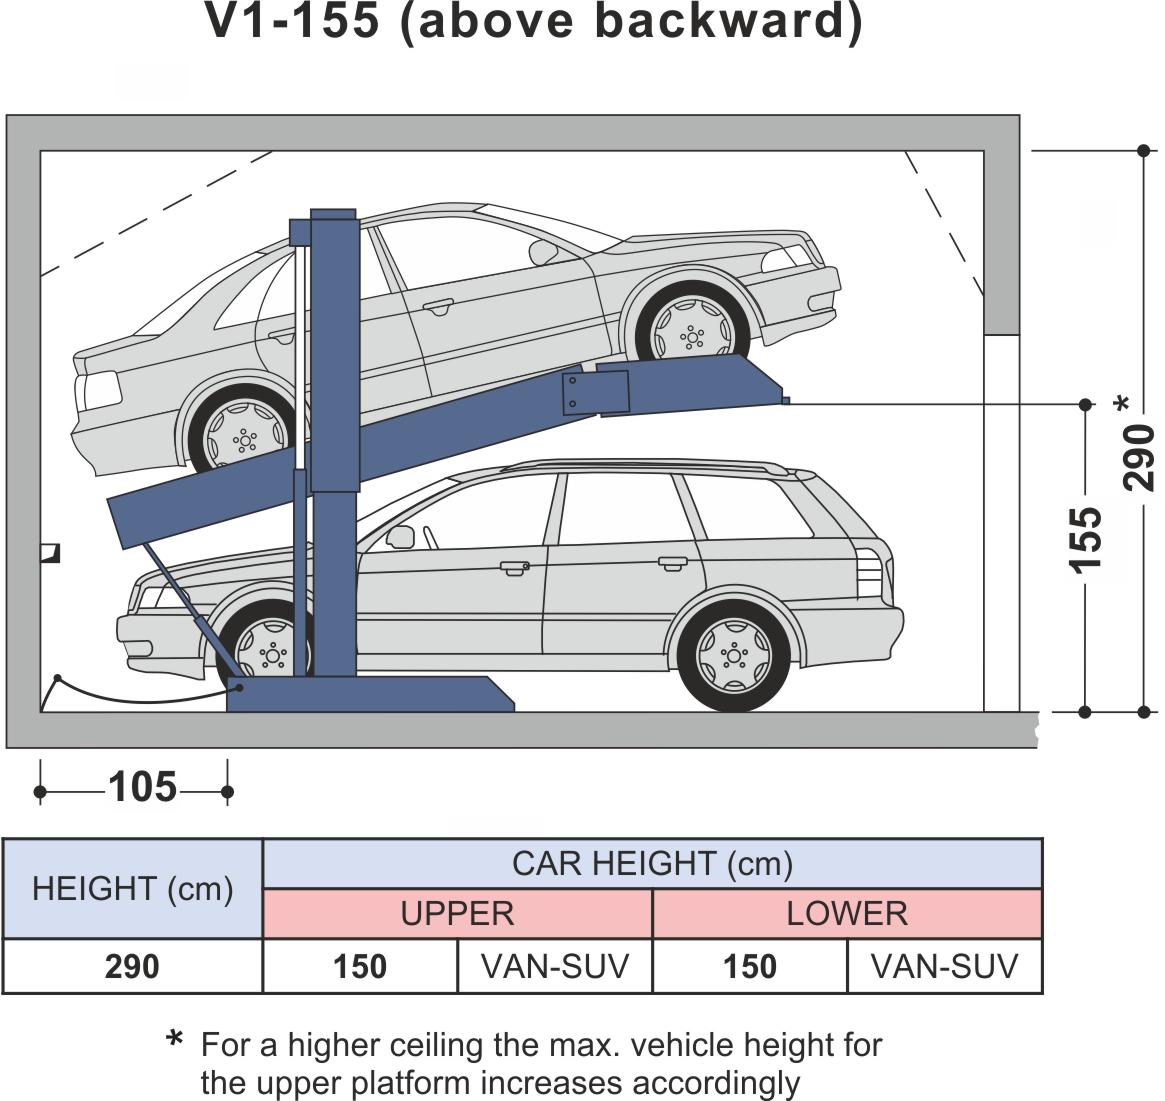 V1-backward-155-290